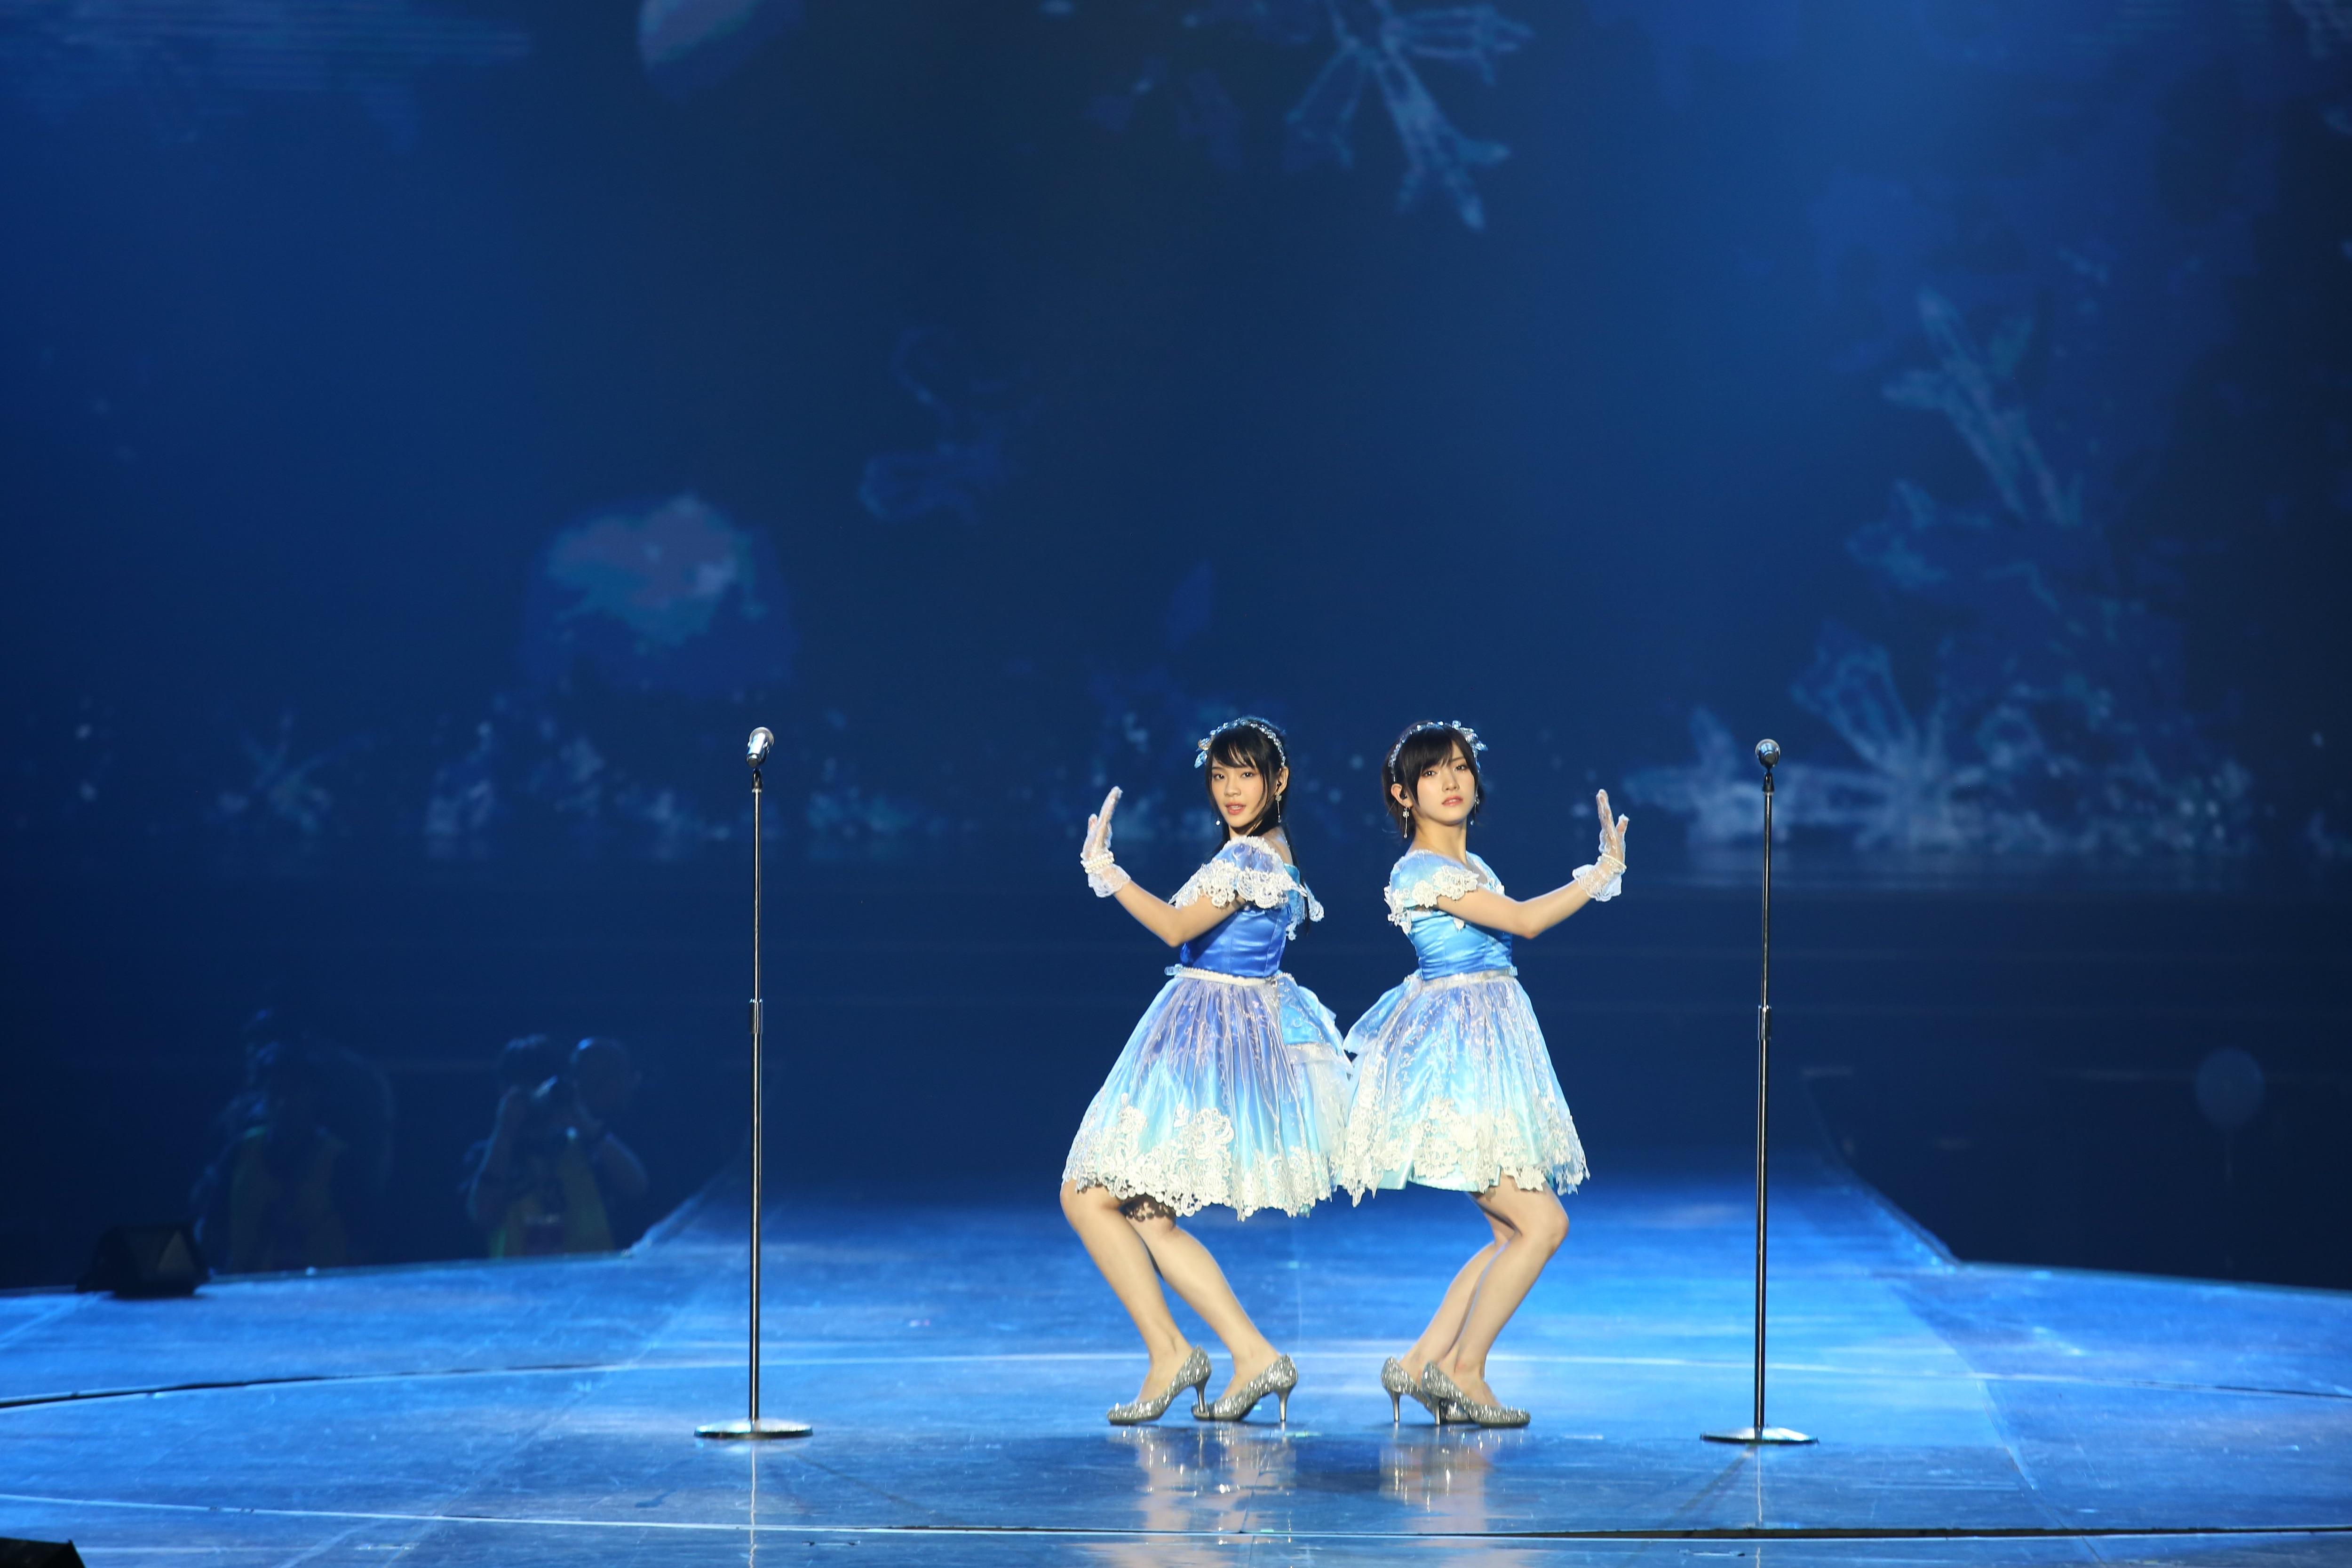 AKB48ほか、海外の姉妹グループが集結し『恋するフォーチュンクッキー』を熱唱!【写真23枚】の画像007